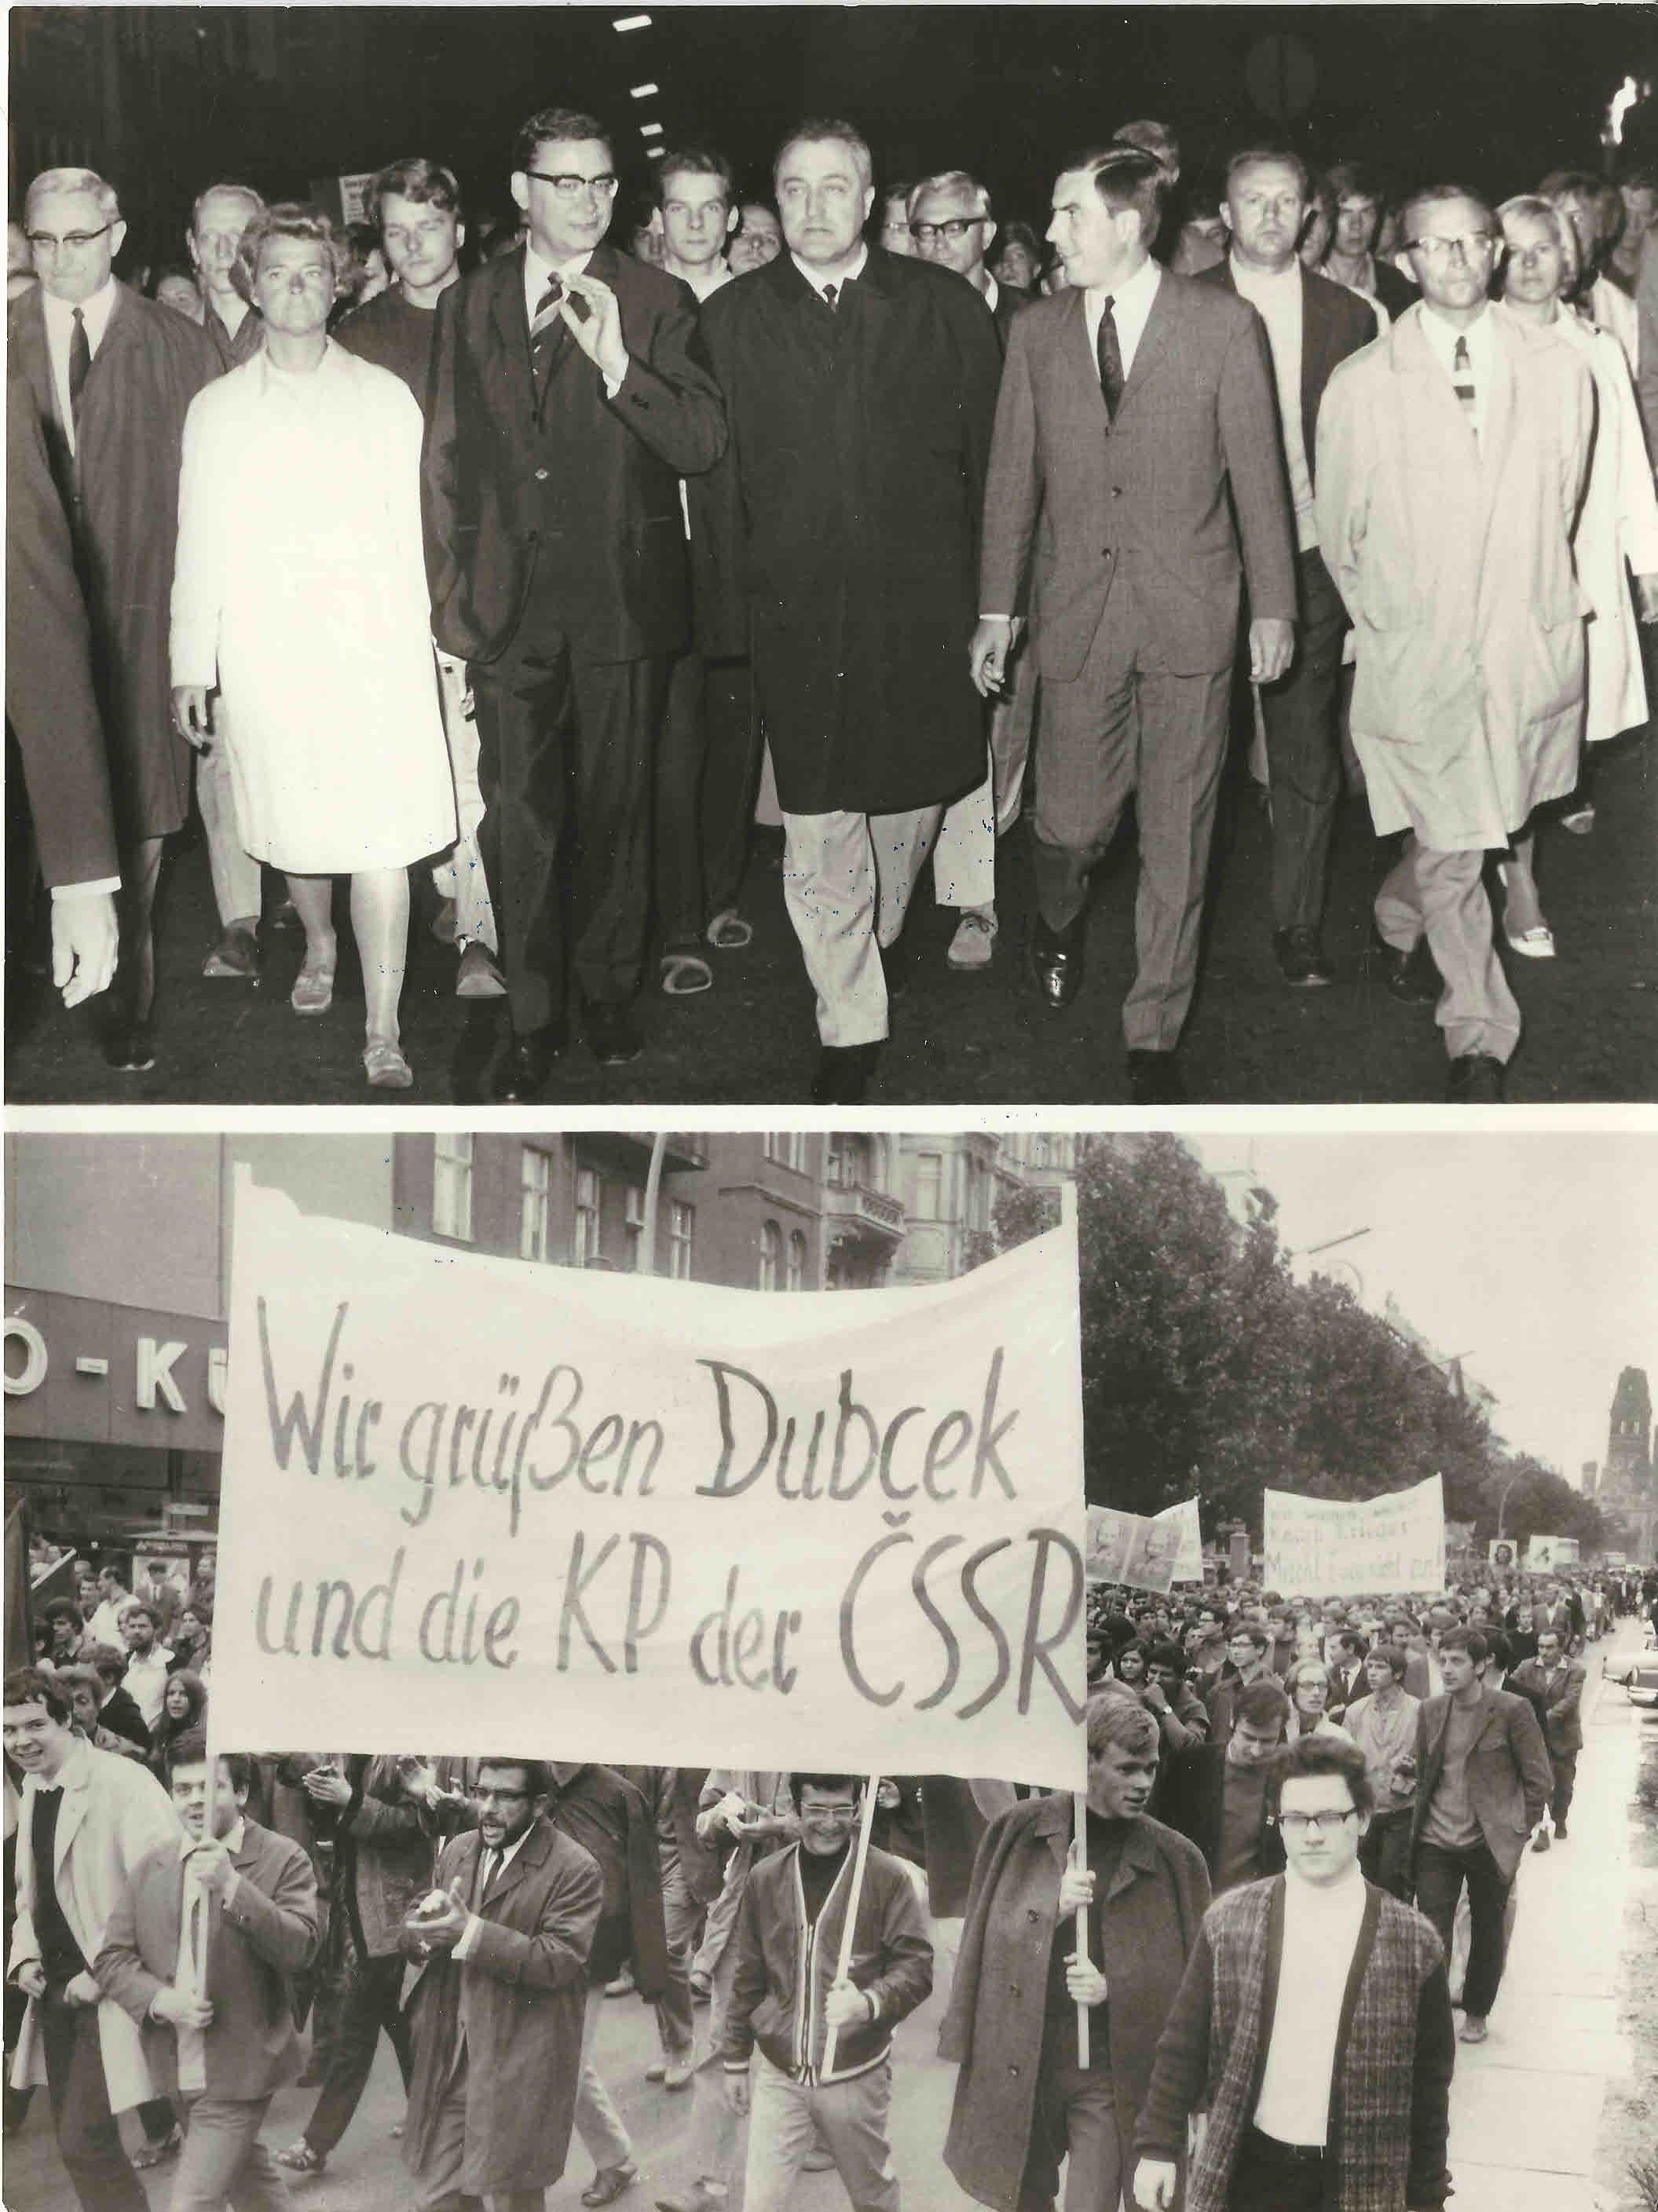 Alemanha manifestao contra a invaso sovitica da checoslovquia alemanha manifestao contra a invaso sovitica da checoslovquia berlim 29 de agosto de 1968 fandeluxe Choice Image